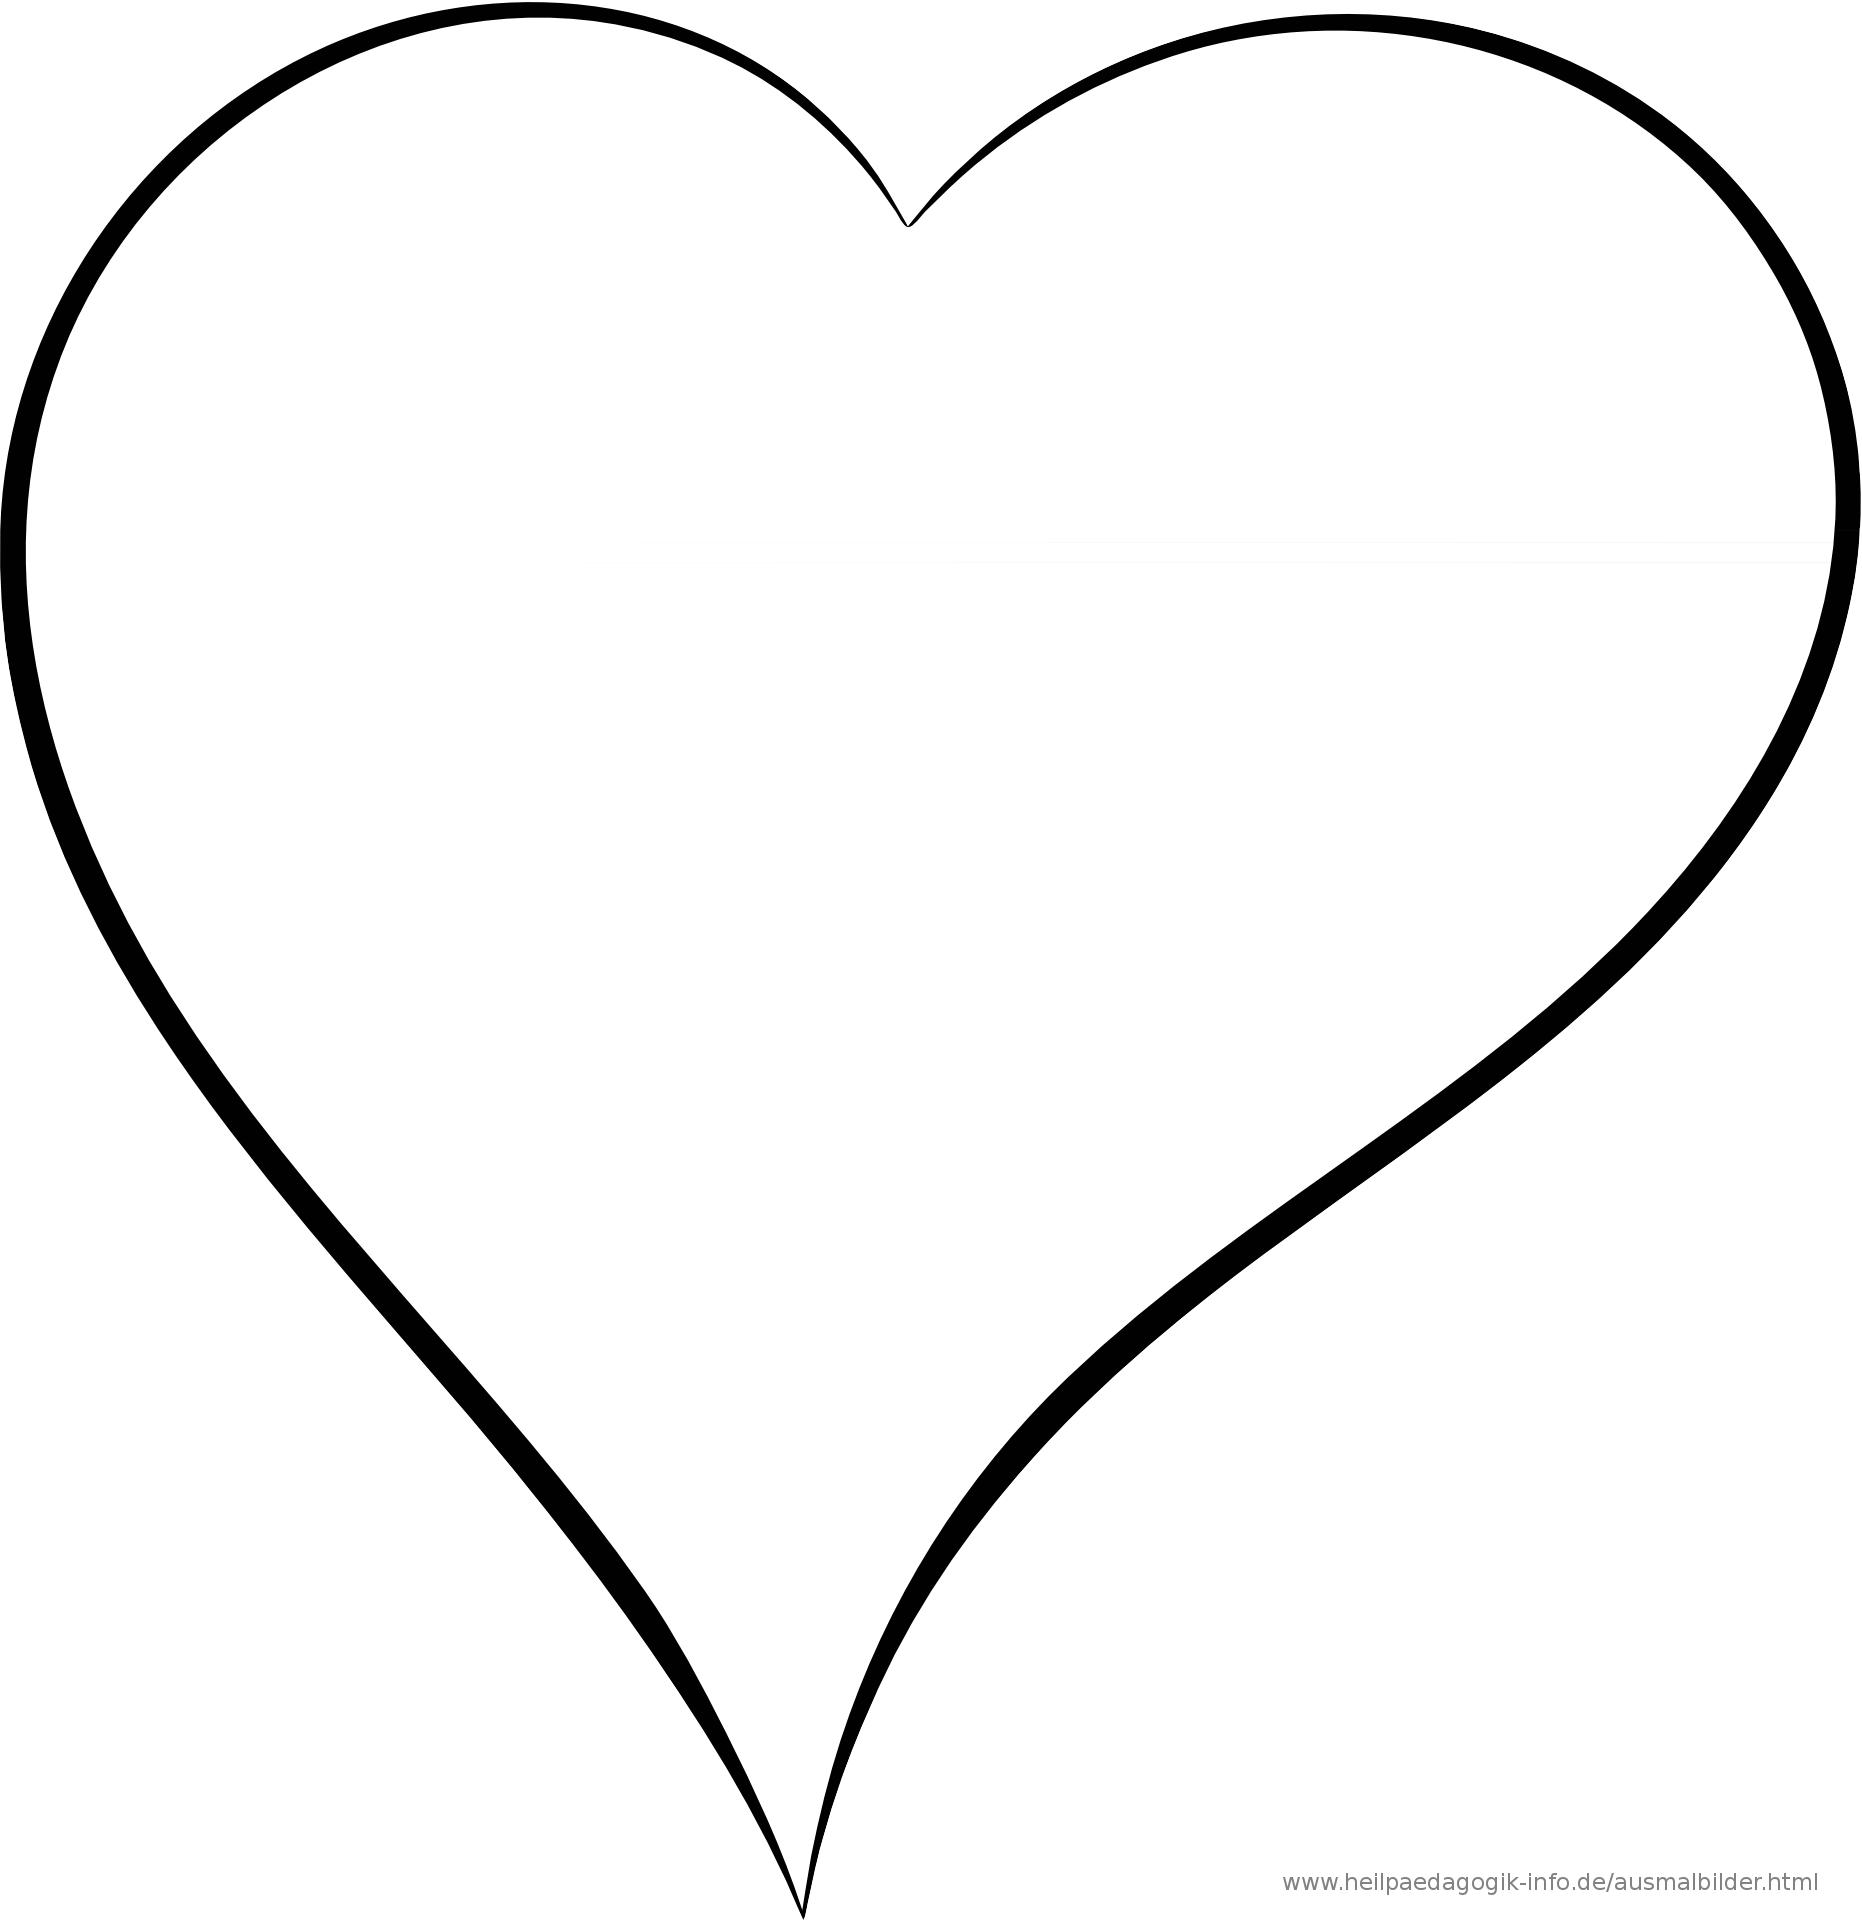 PNG Herz Transparent Herz.PNG Images. | PlusPNG